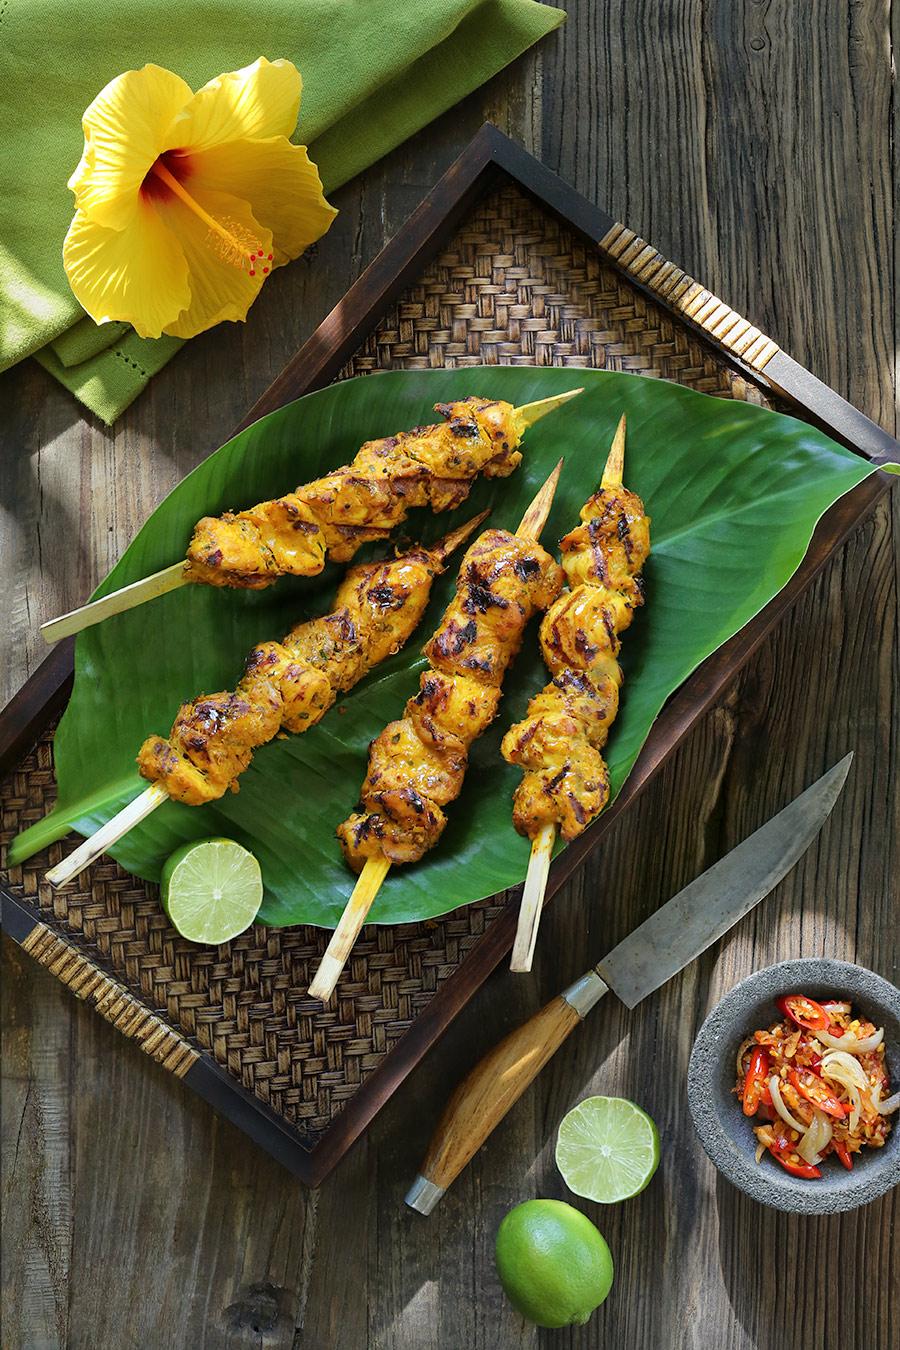 Chicken satay recipe from Bali.